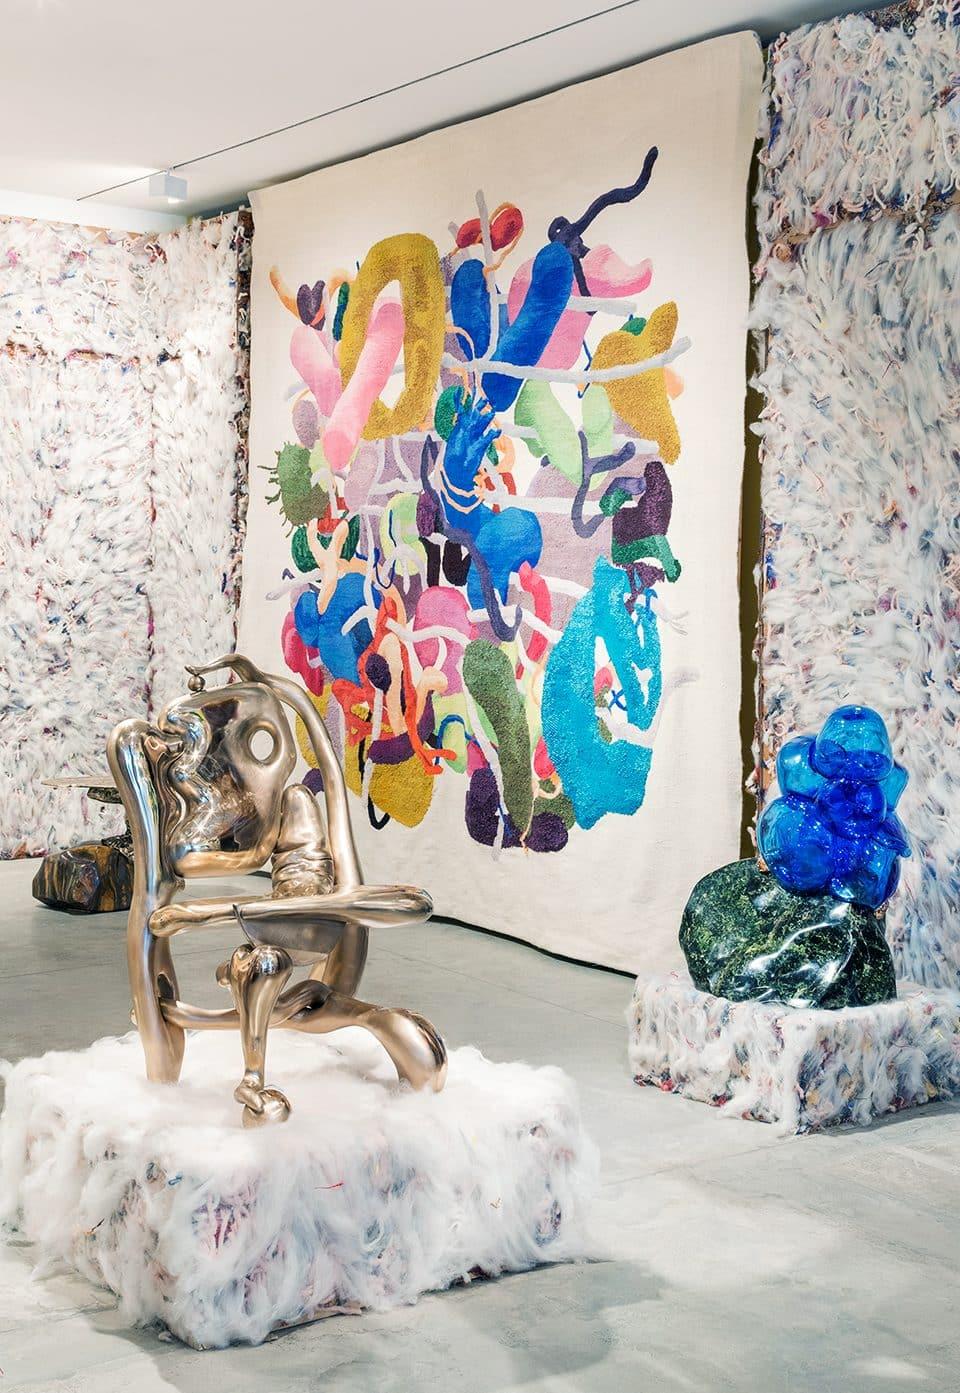 Misha Kahn's Arty Furniture Celebrates the Goopier Side of Life